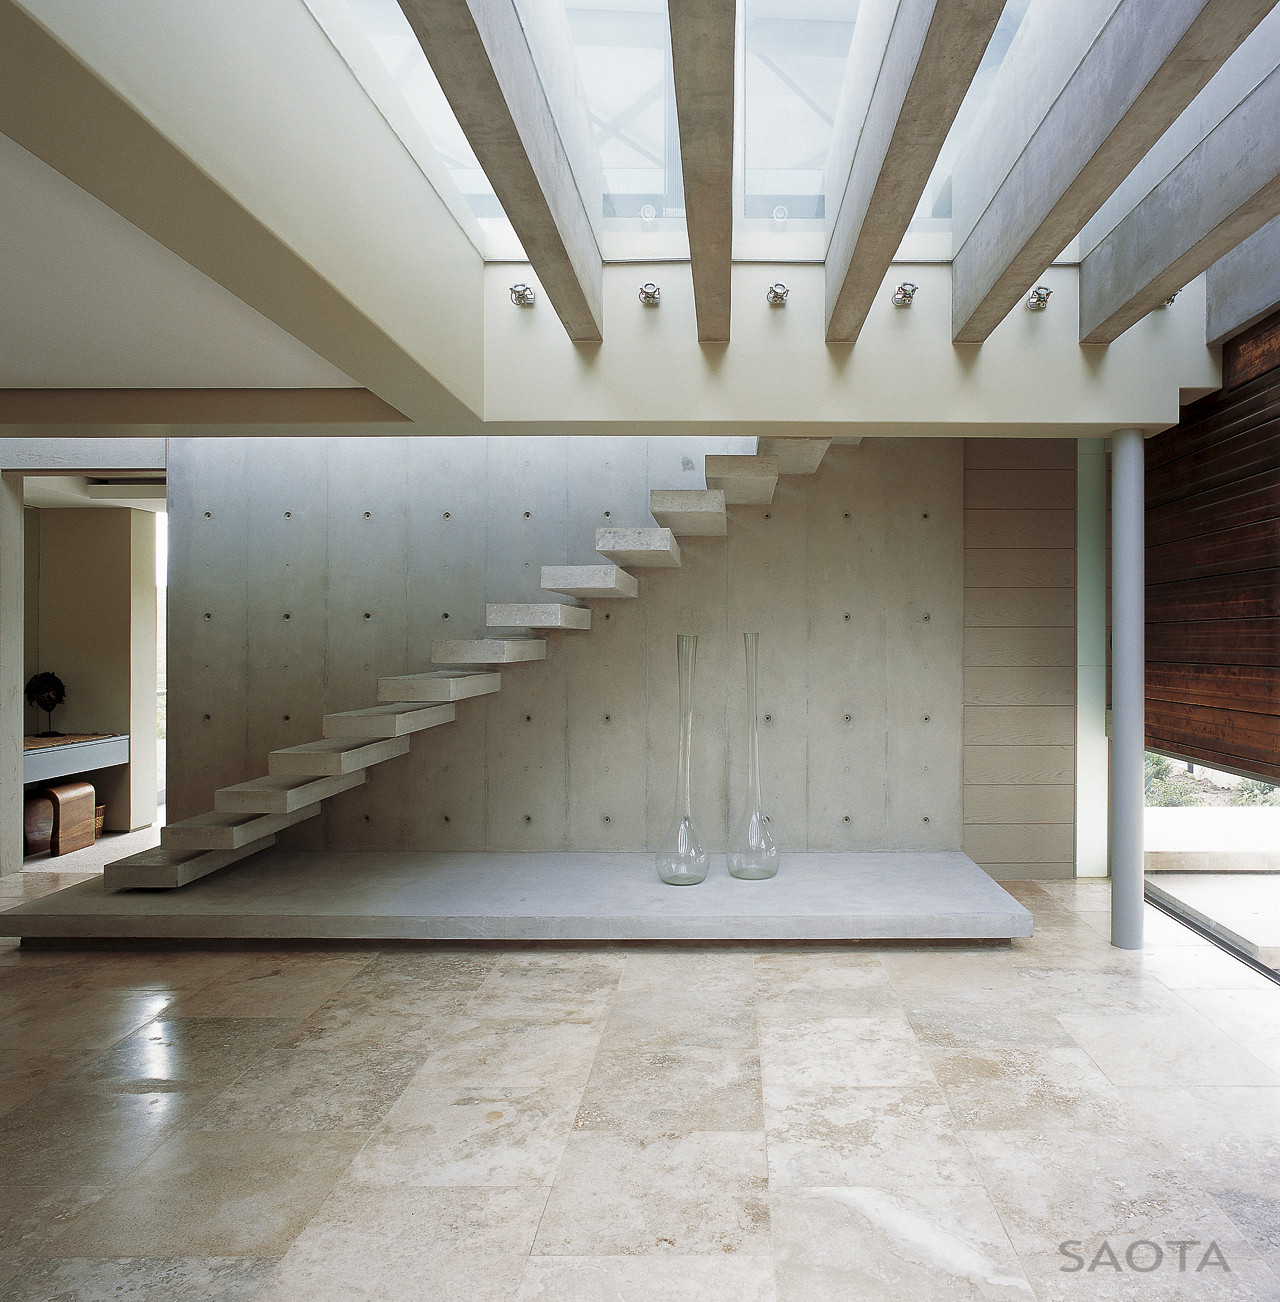 Cove 6 / SAOTA – Stefan Antoni Olmesdahl Truen Architects